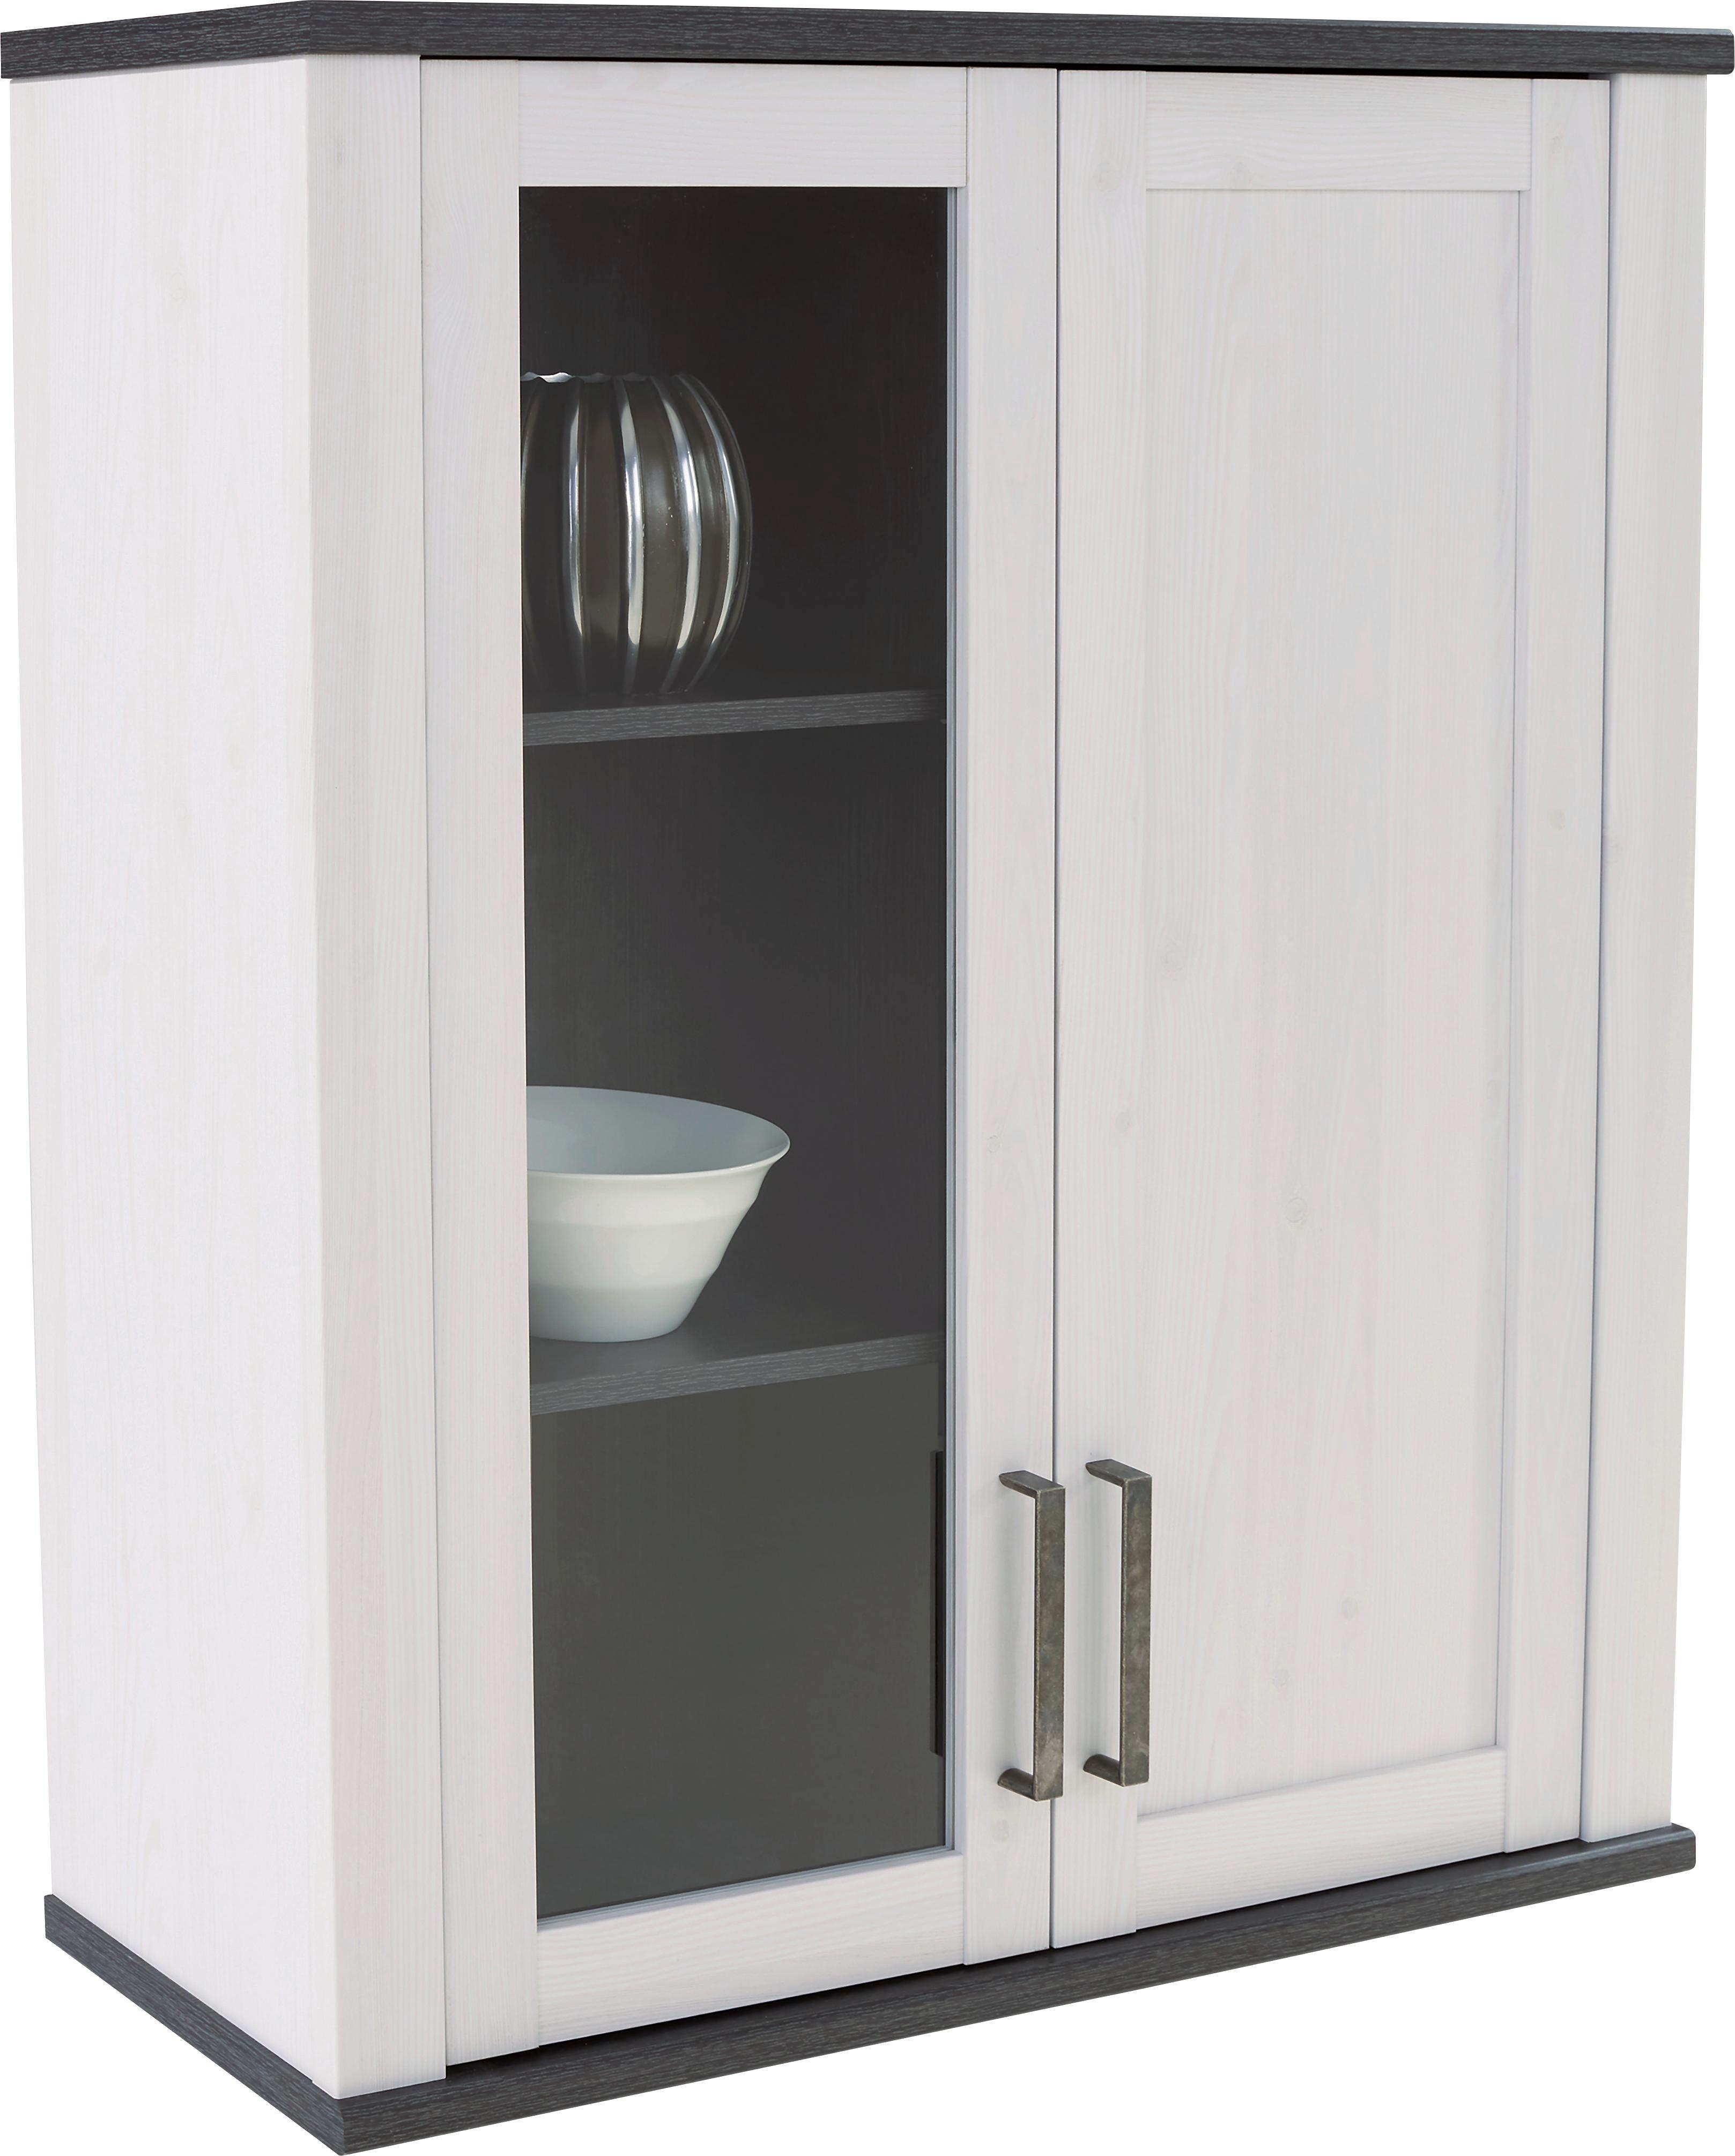 Falivitrin Provence - tiszta/fehér, romantikus/Landhaus, faanyagok (98,1/104/30cm) - JAMES WOOD